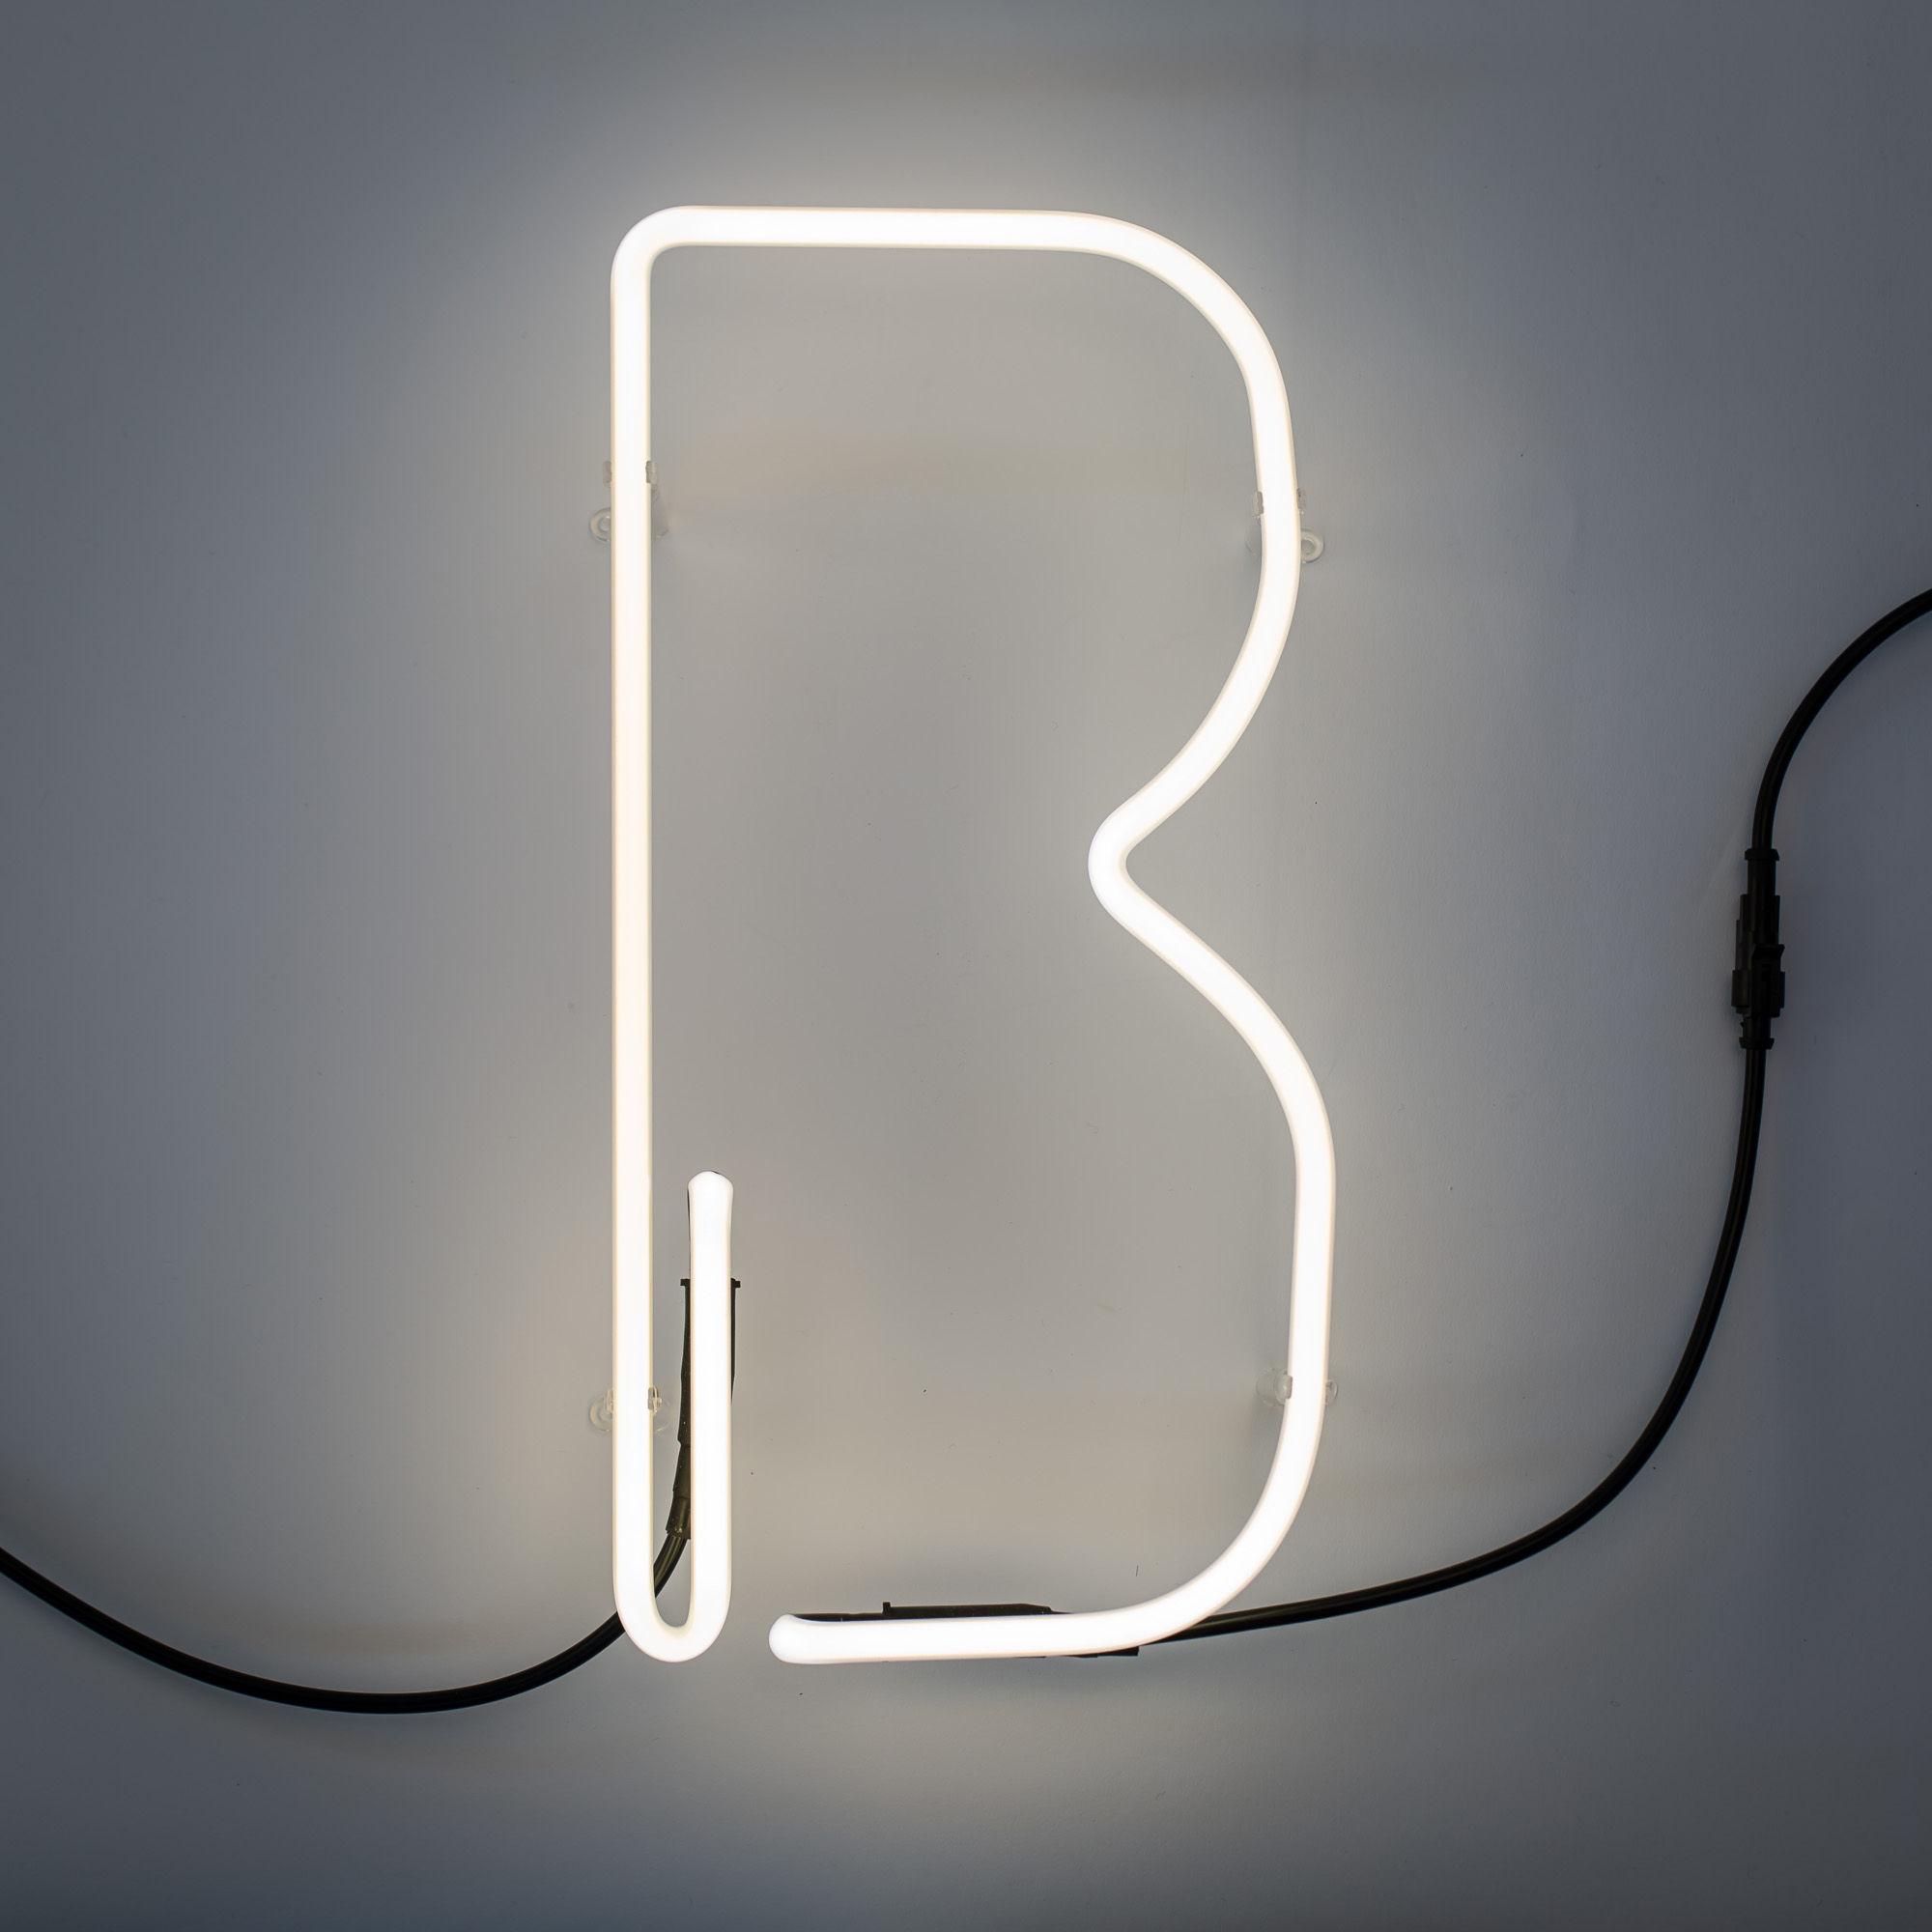 Applique n on alphafont lettre b lettre b seletti - Applique neon design ...